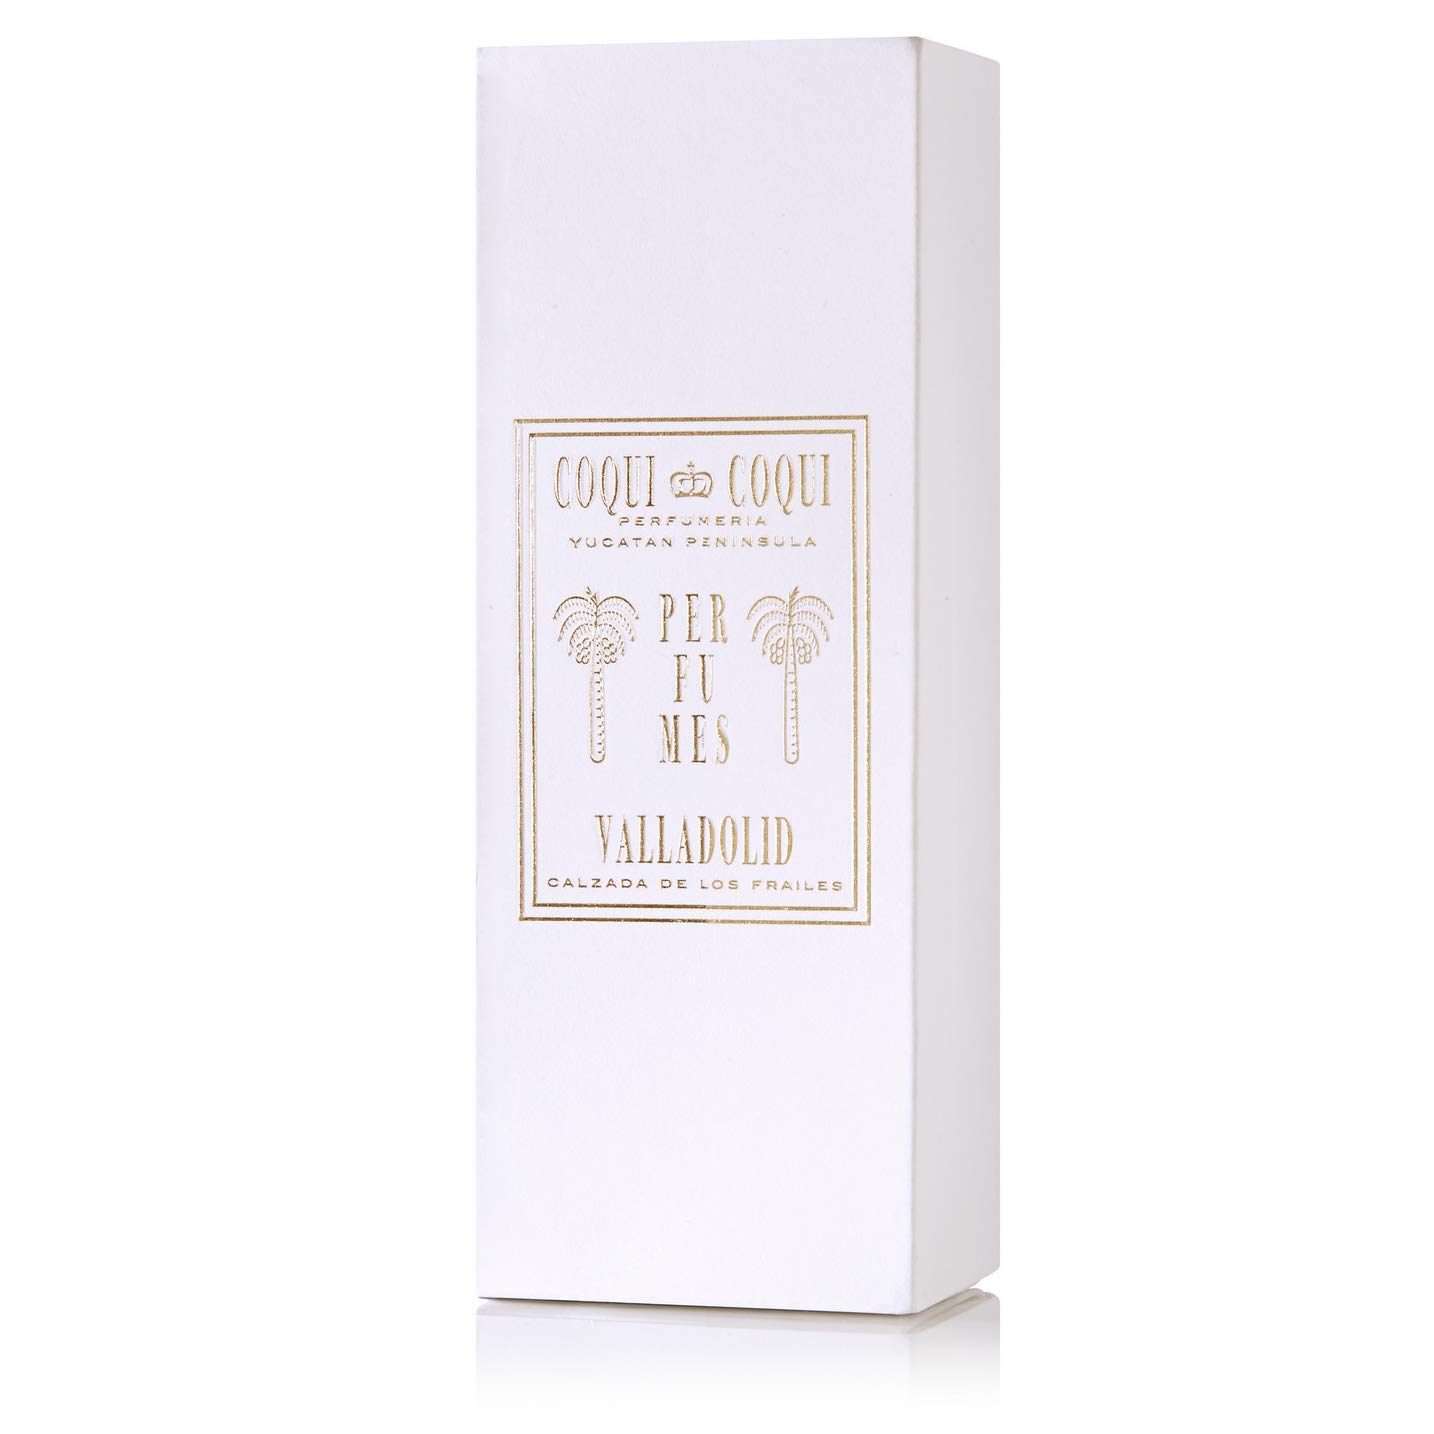 Amazon.com : Coqui Coqui Flor de Naranjo Eau de Cologne - 100 ml : Beauty